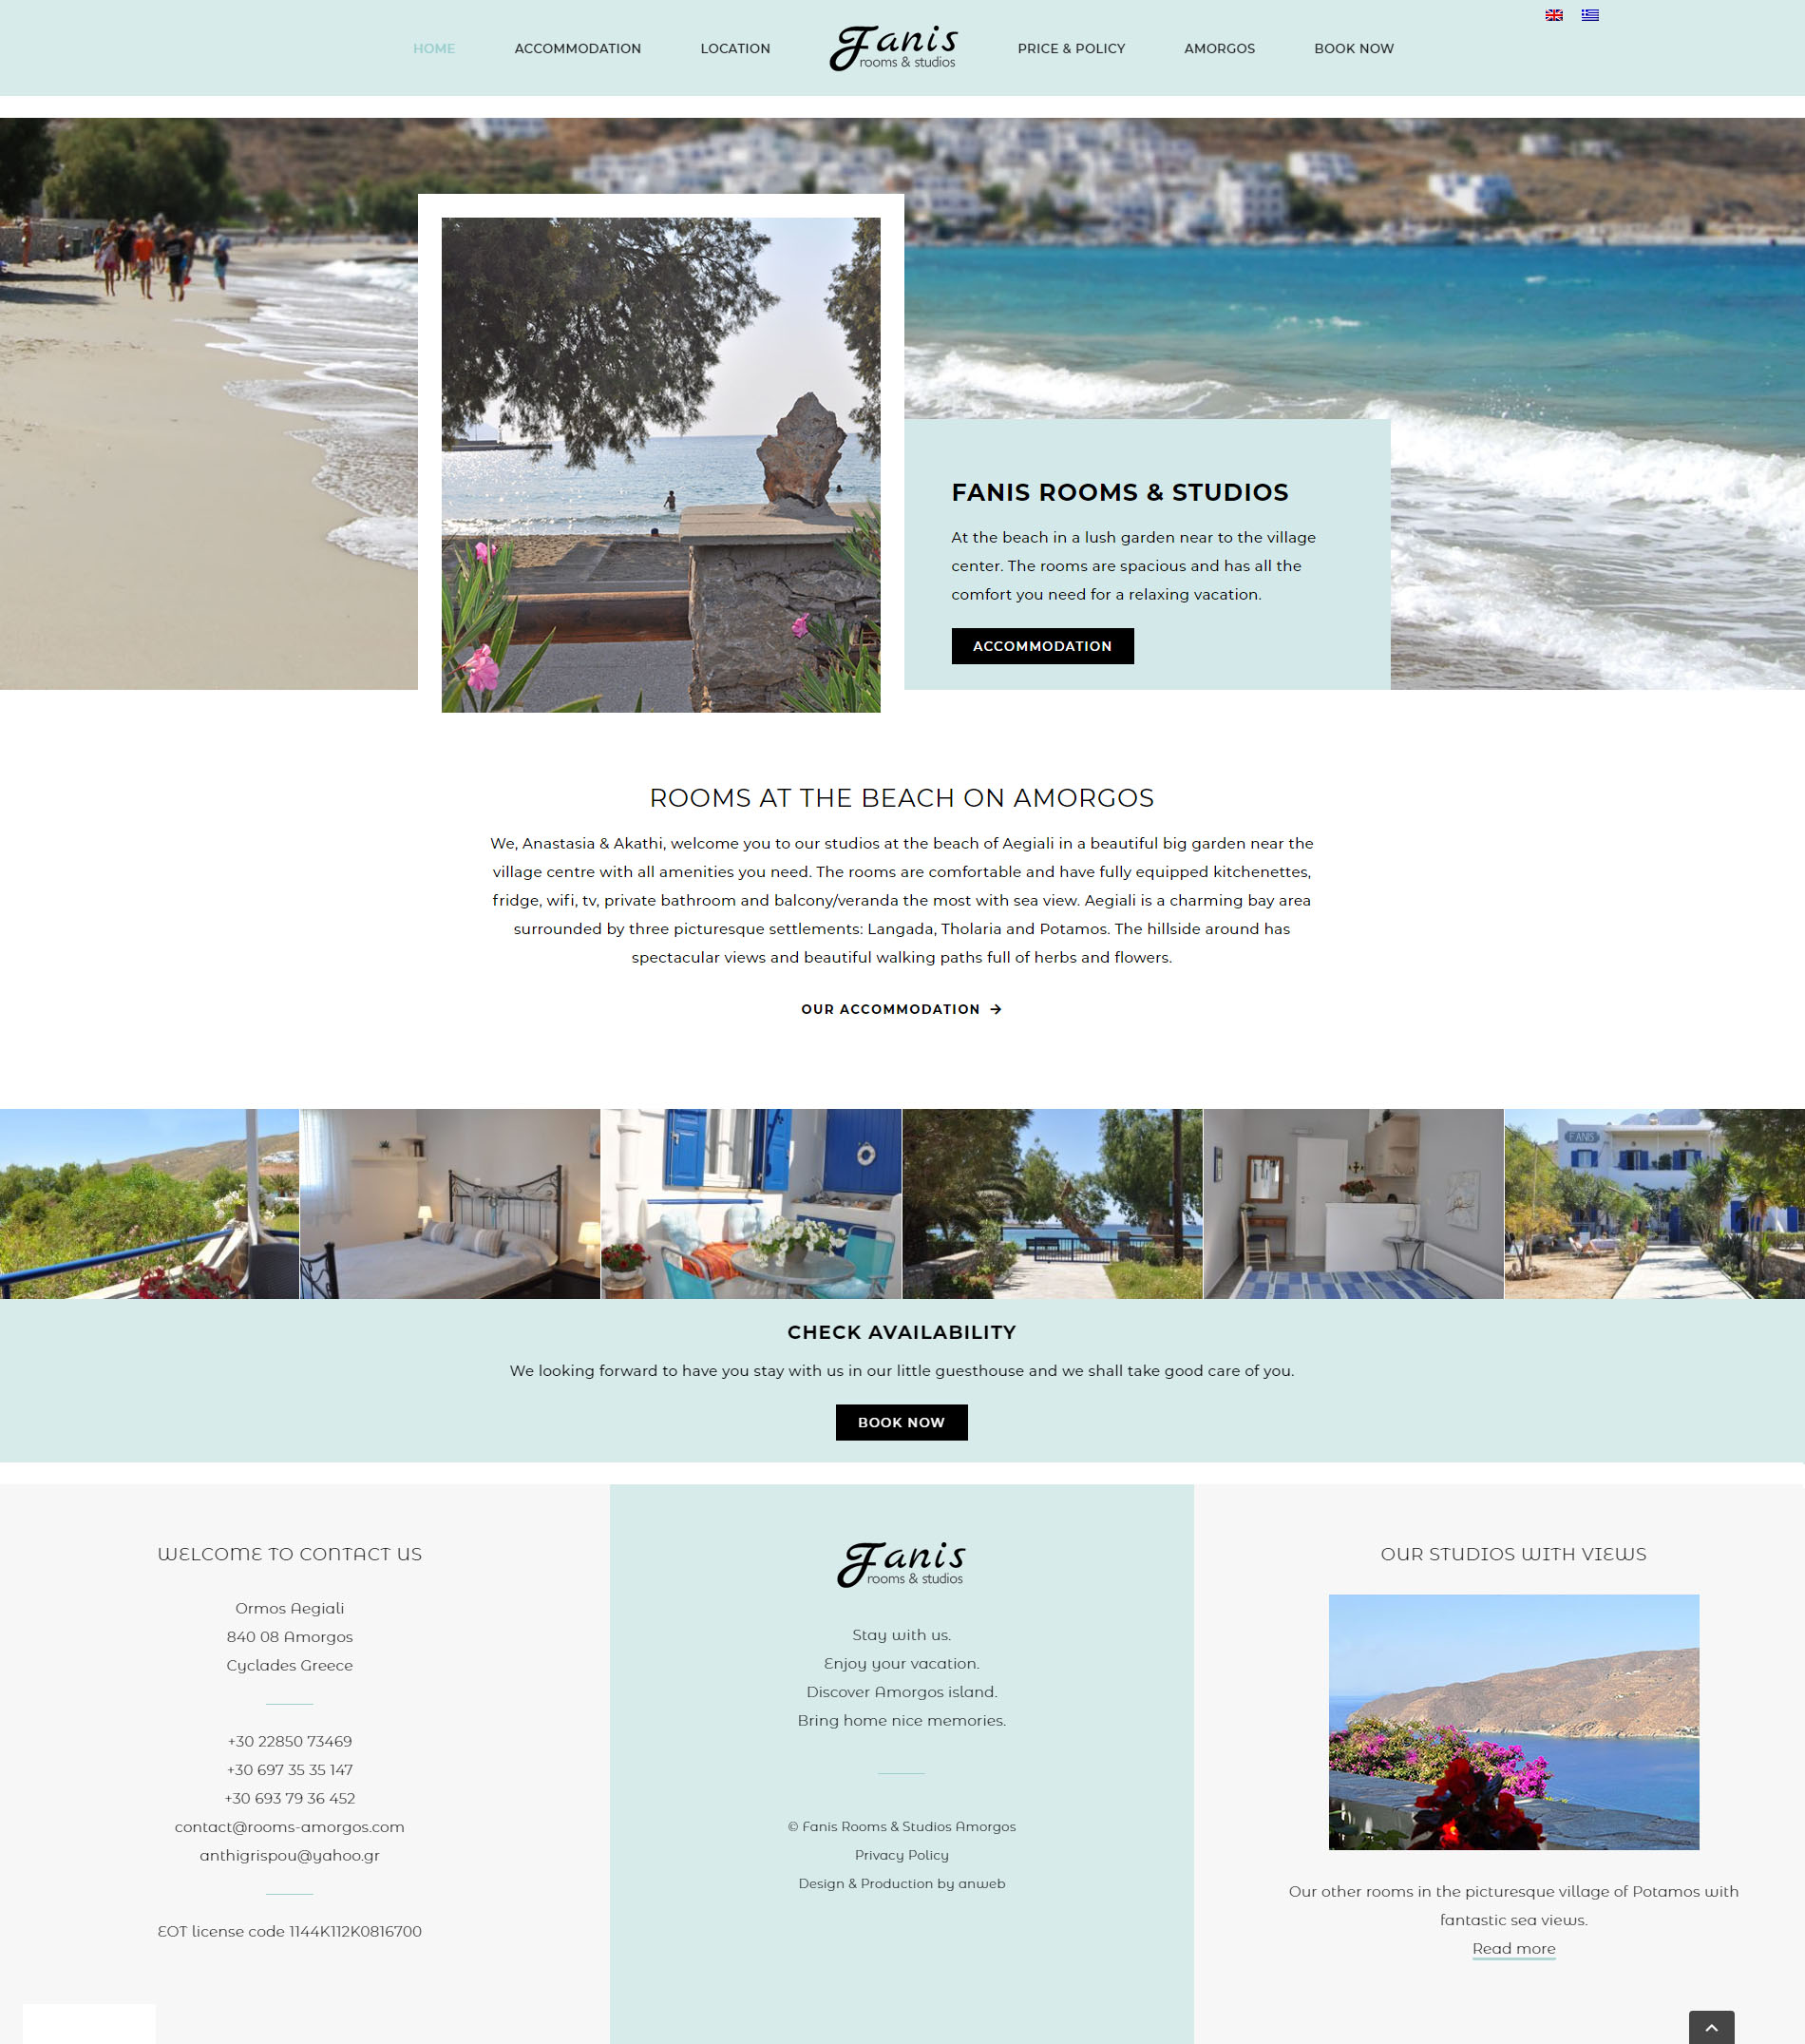 Rooms and Studios Amorgos anweb design